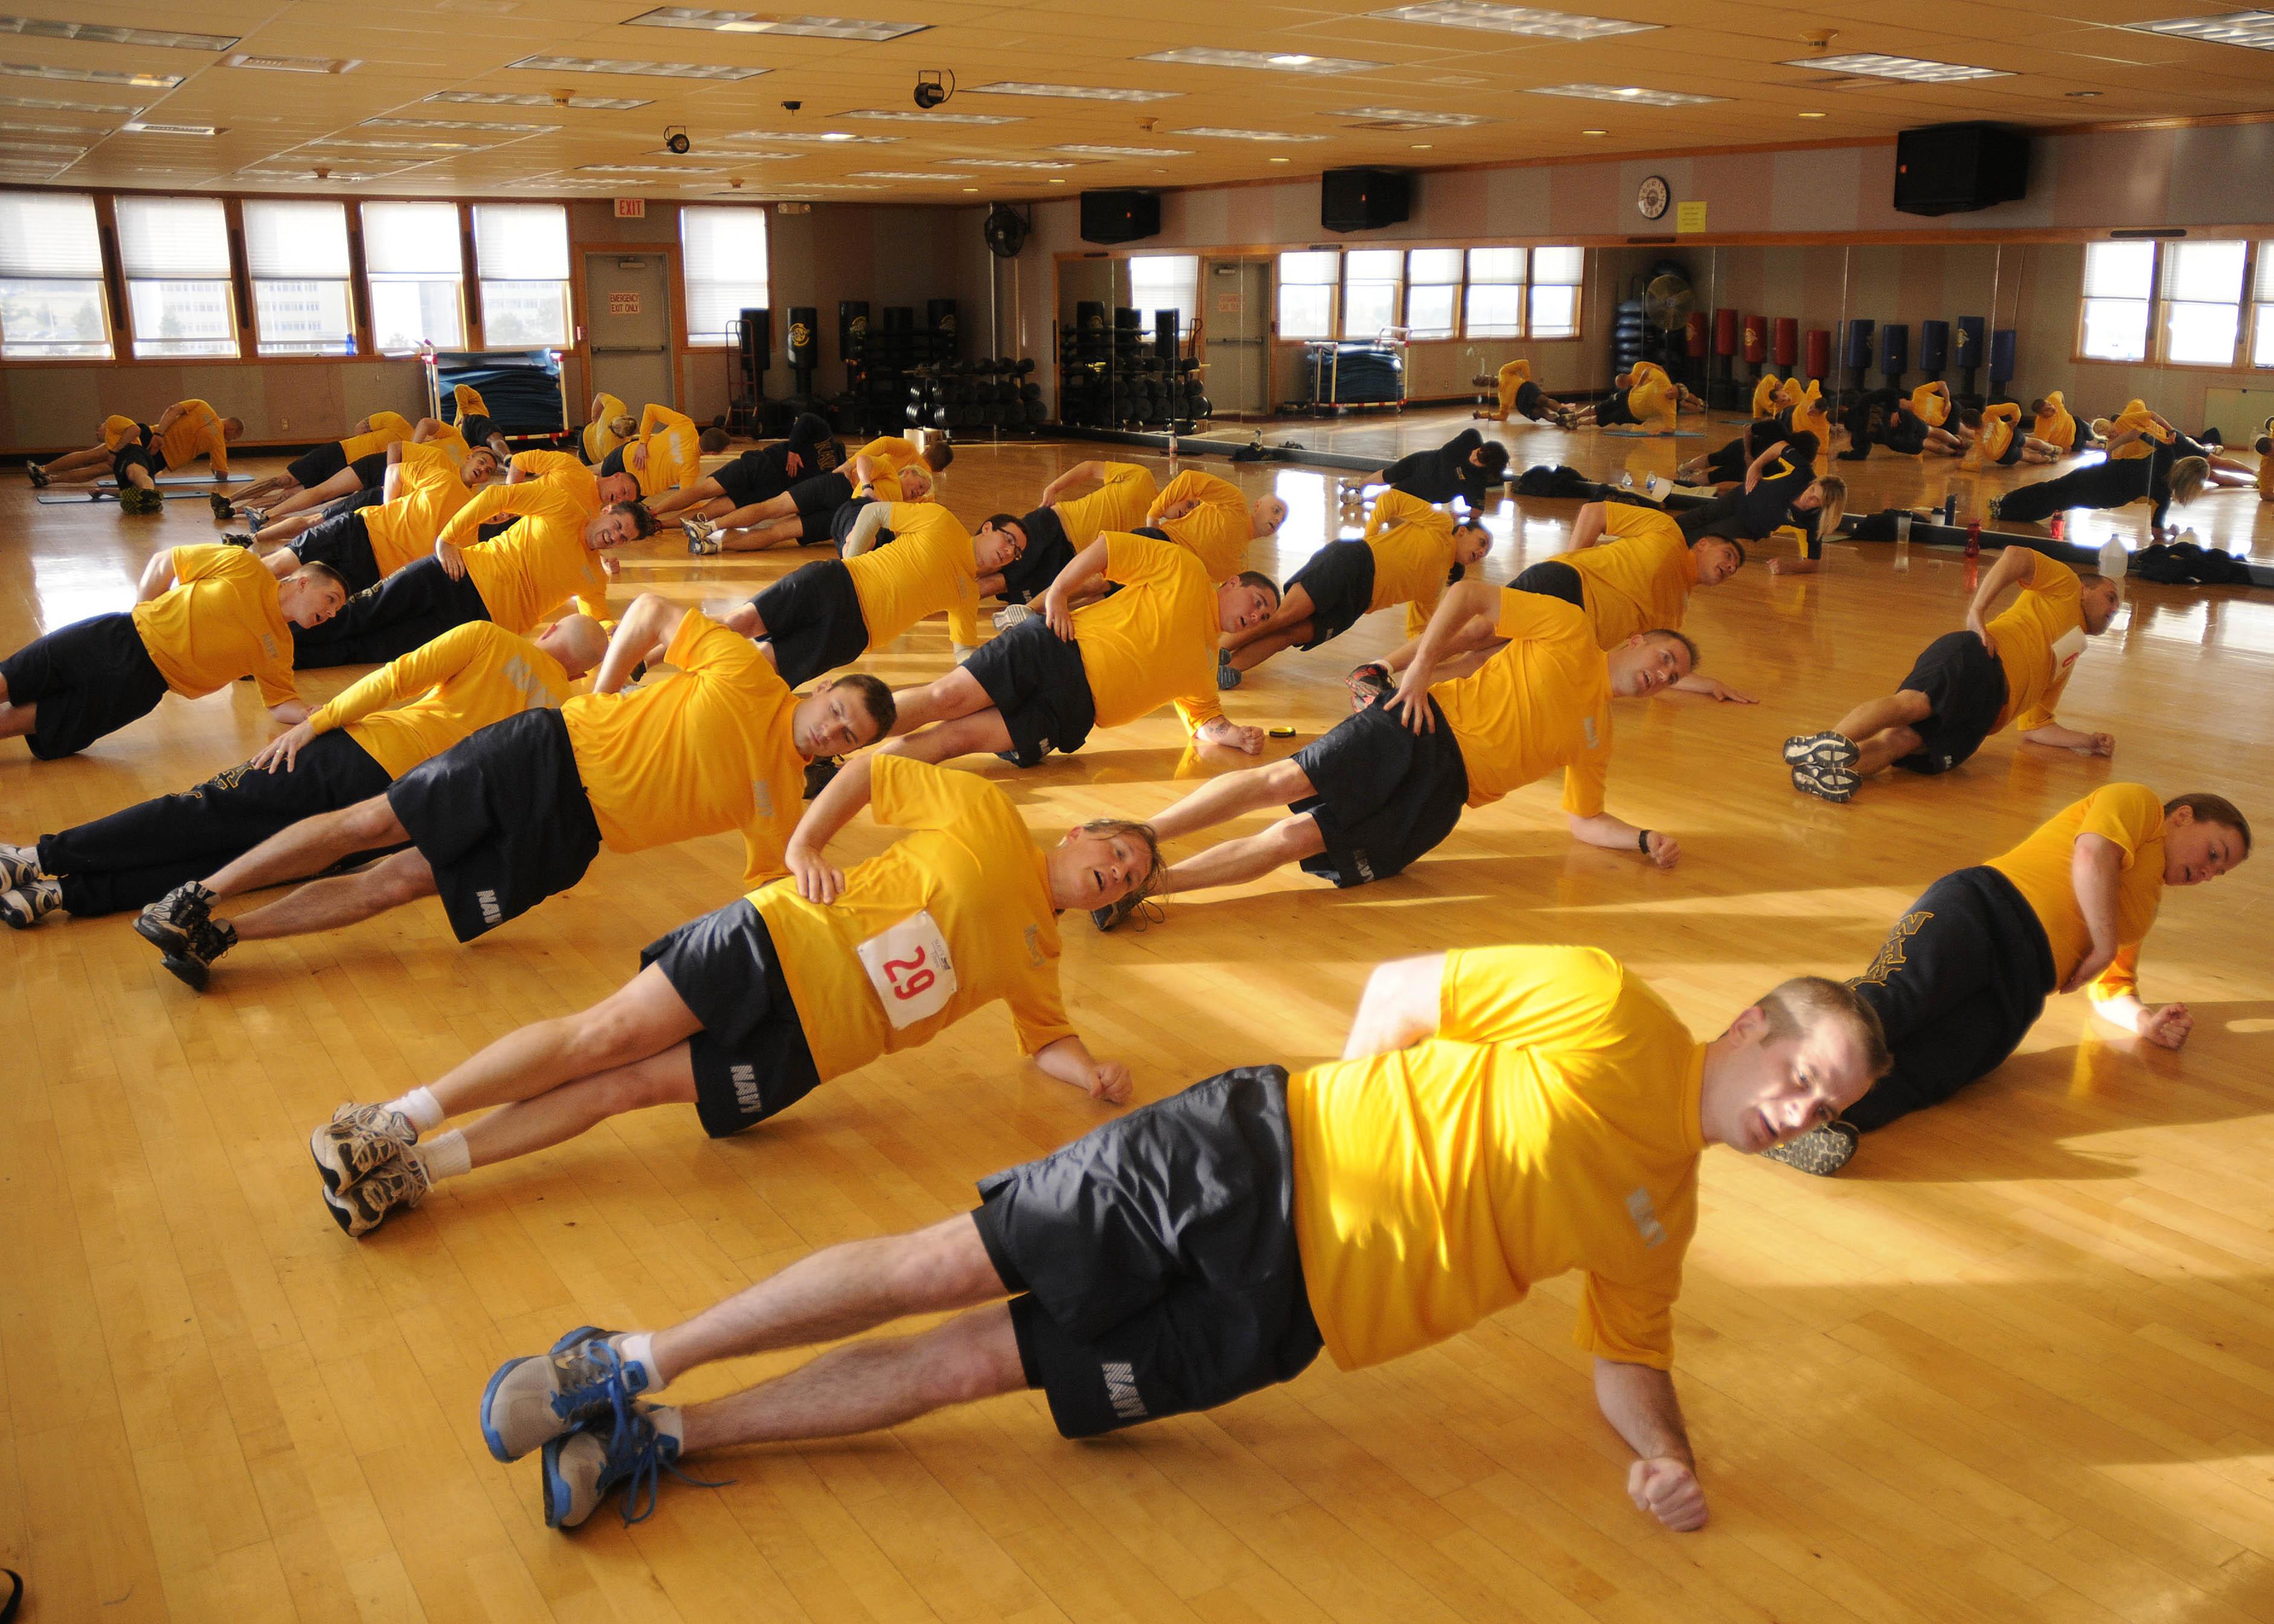 CFL course, NASWI, Fitness